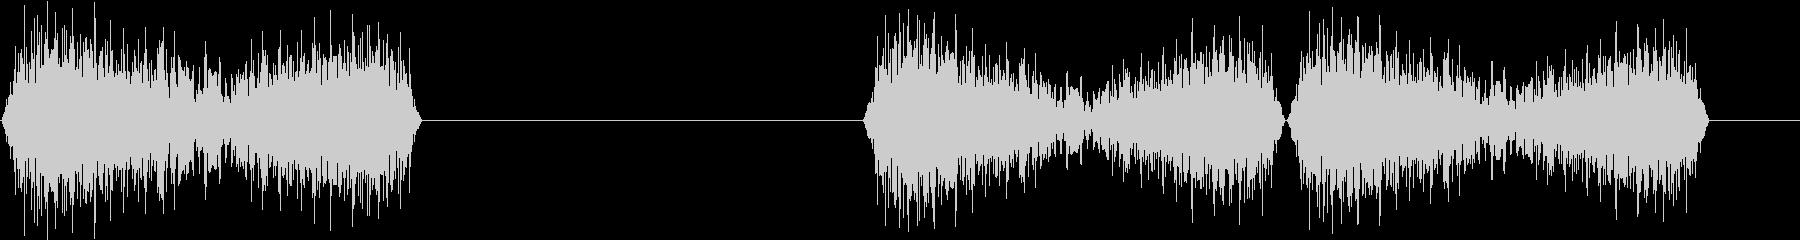 DJプレイ スクラッチ・ノイズ 9 煽りの未再生の波形